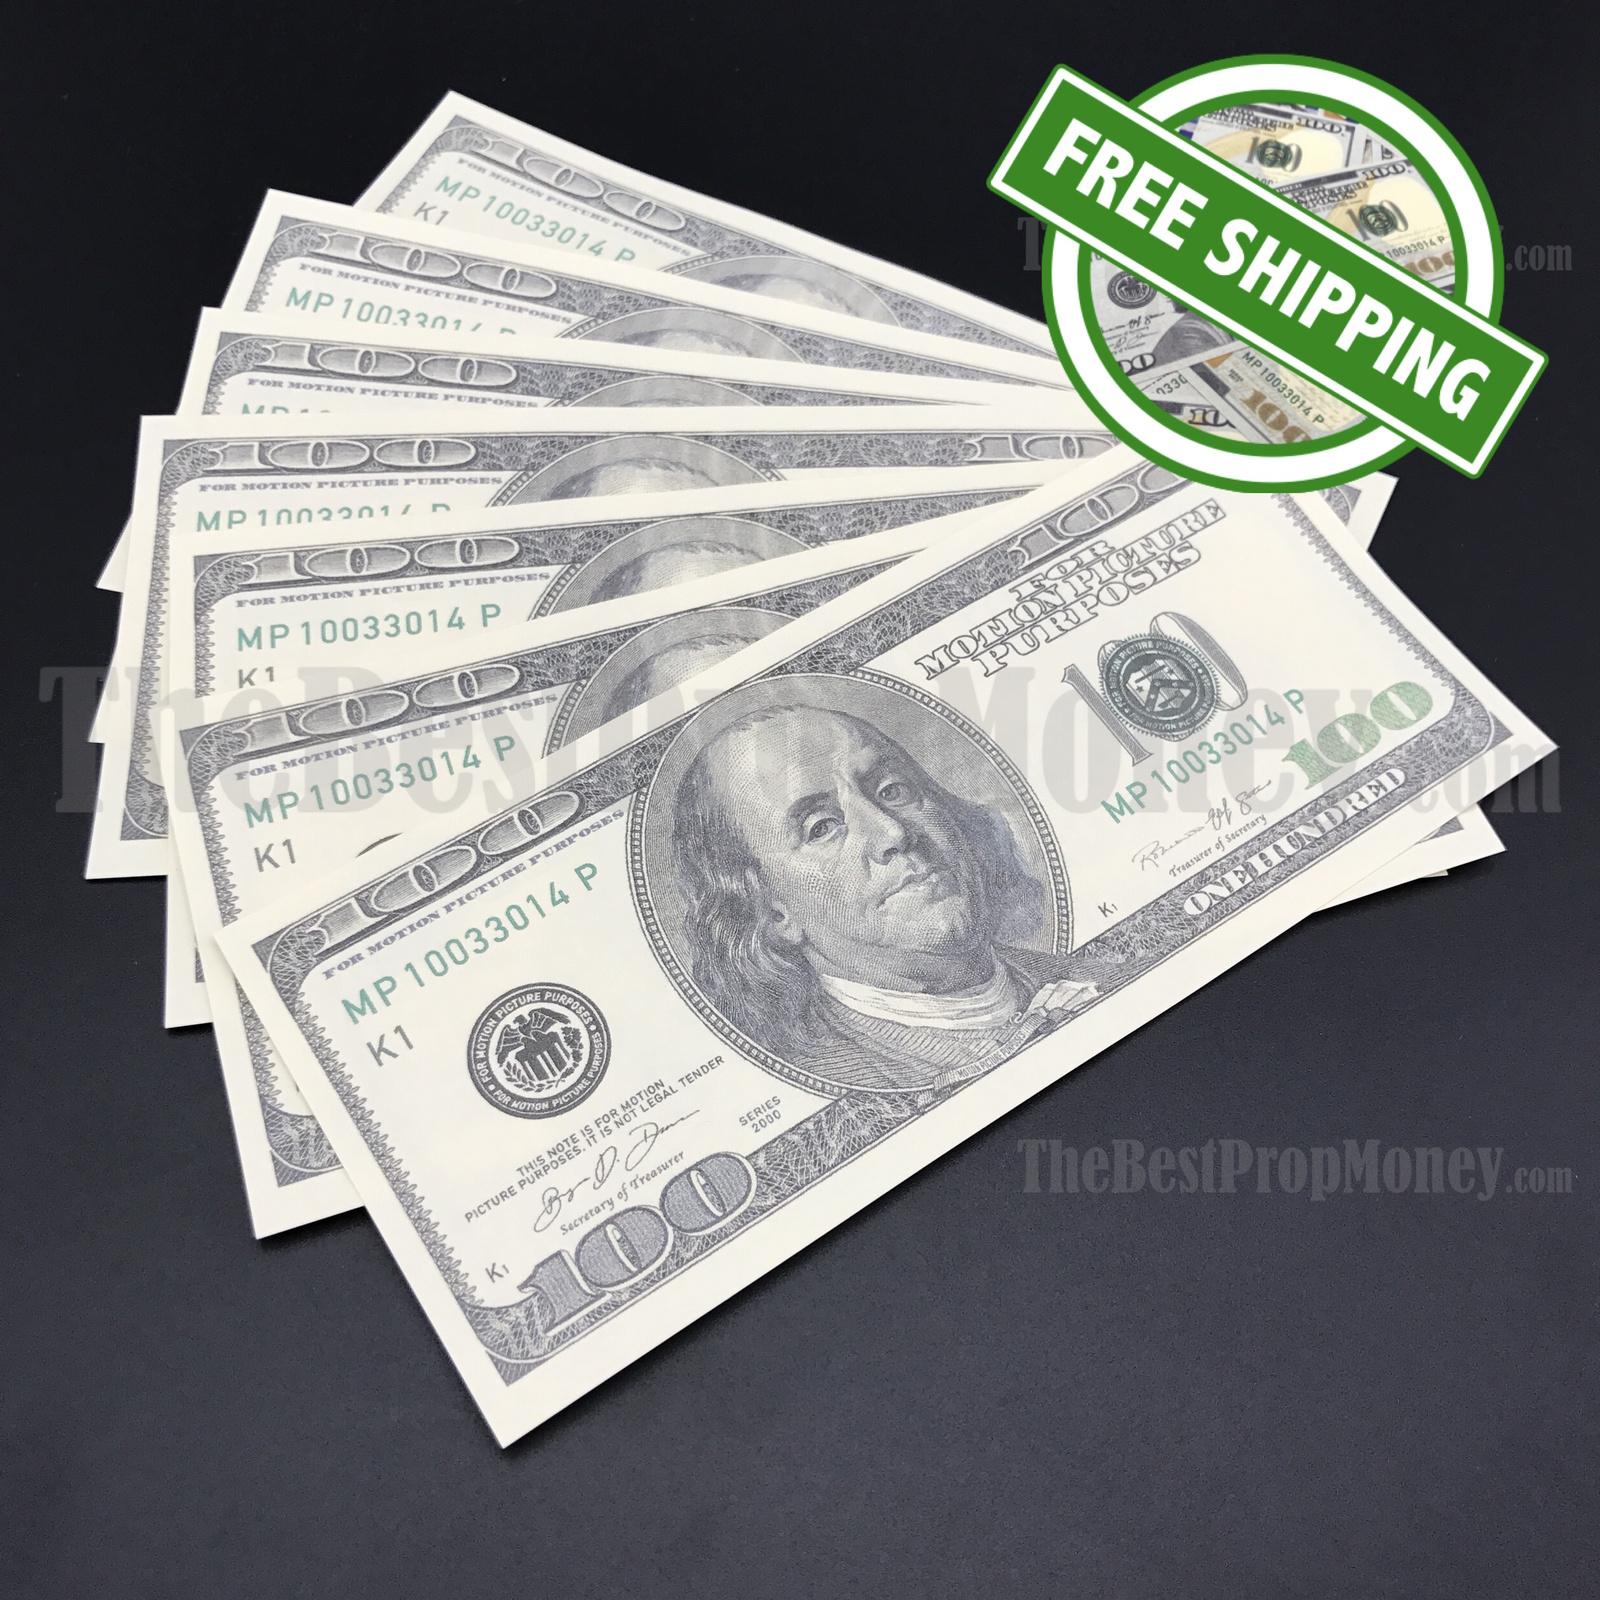 THE BEST FAKE MONEY - 7x $100 Bills - $700 - 2000s Style - Play Fun Joke Prank F for sale  USA